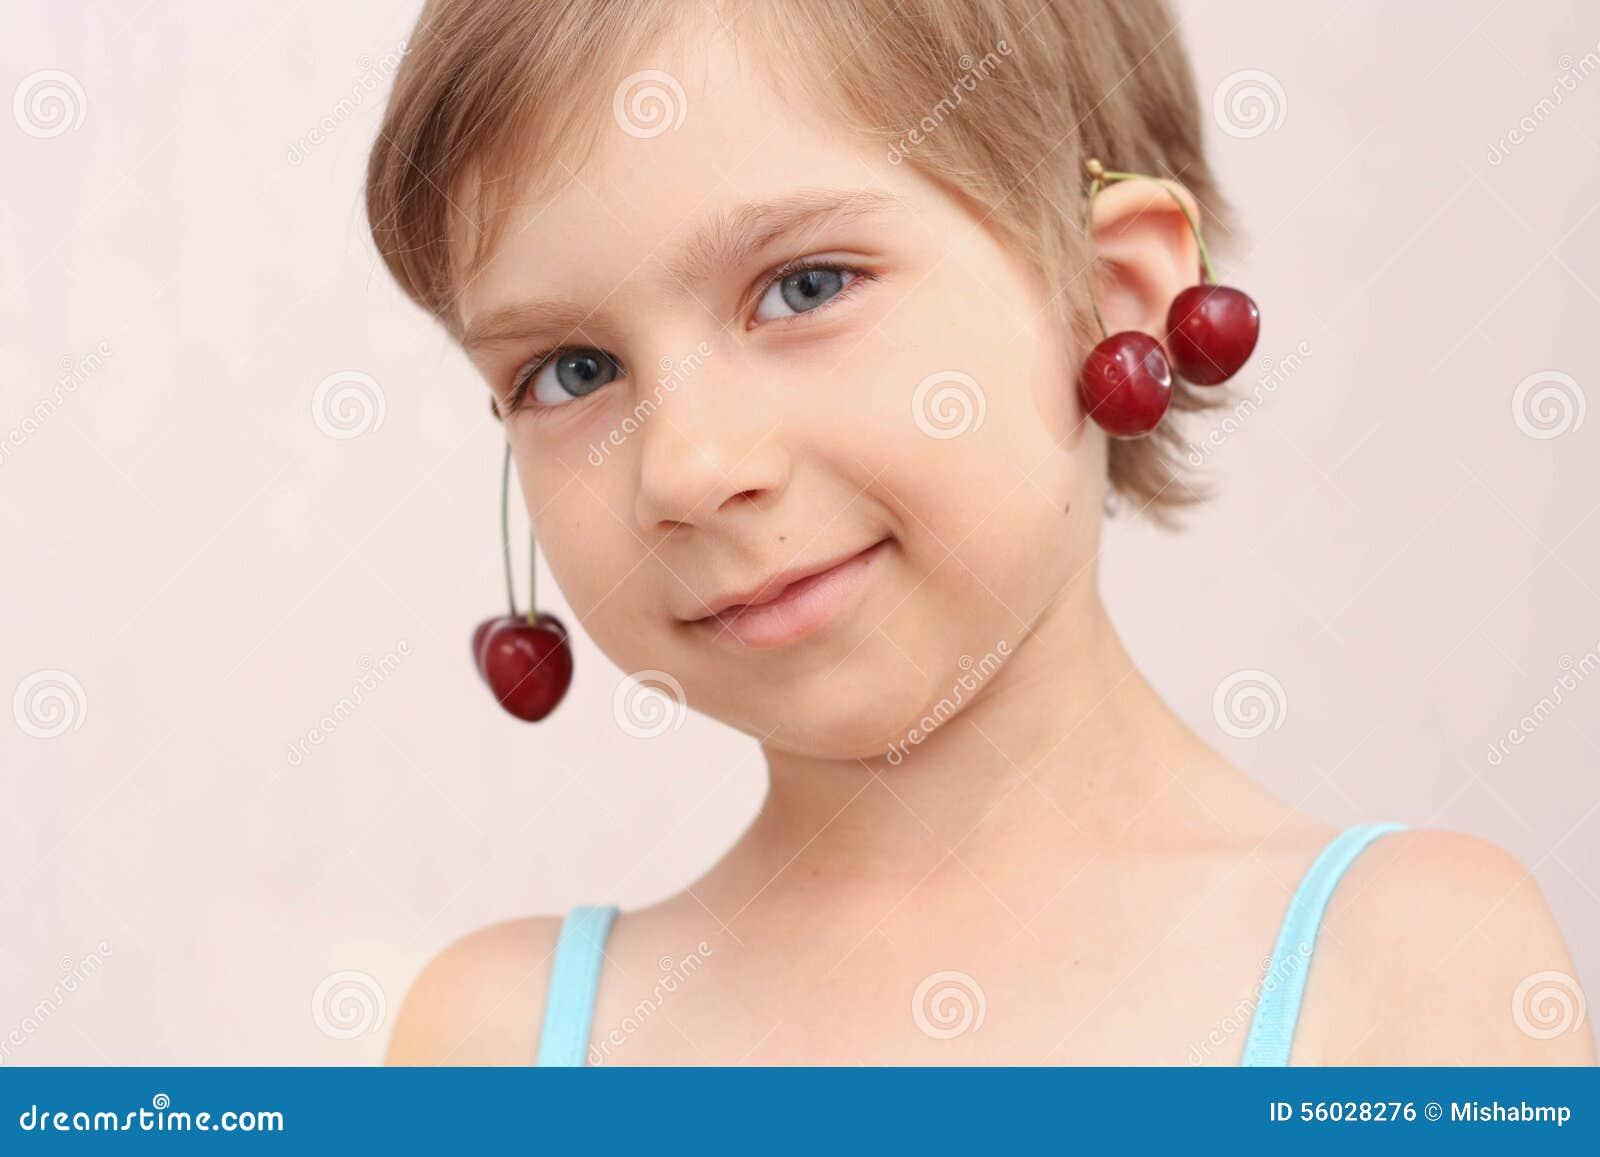 Little Girl With Cherries Earrings